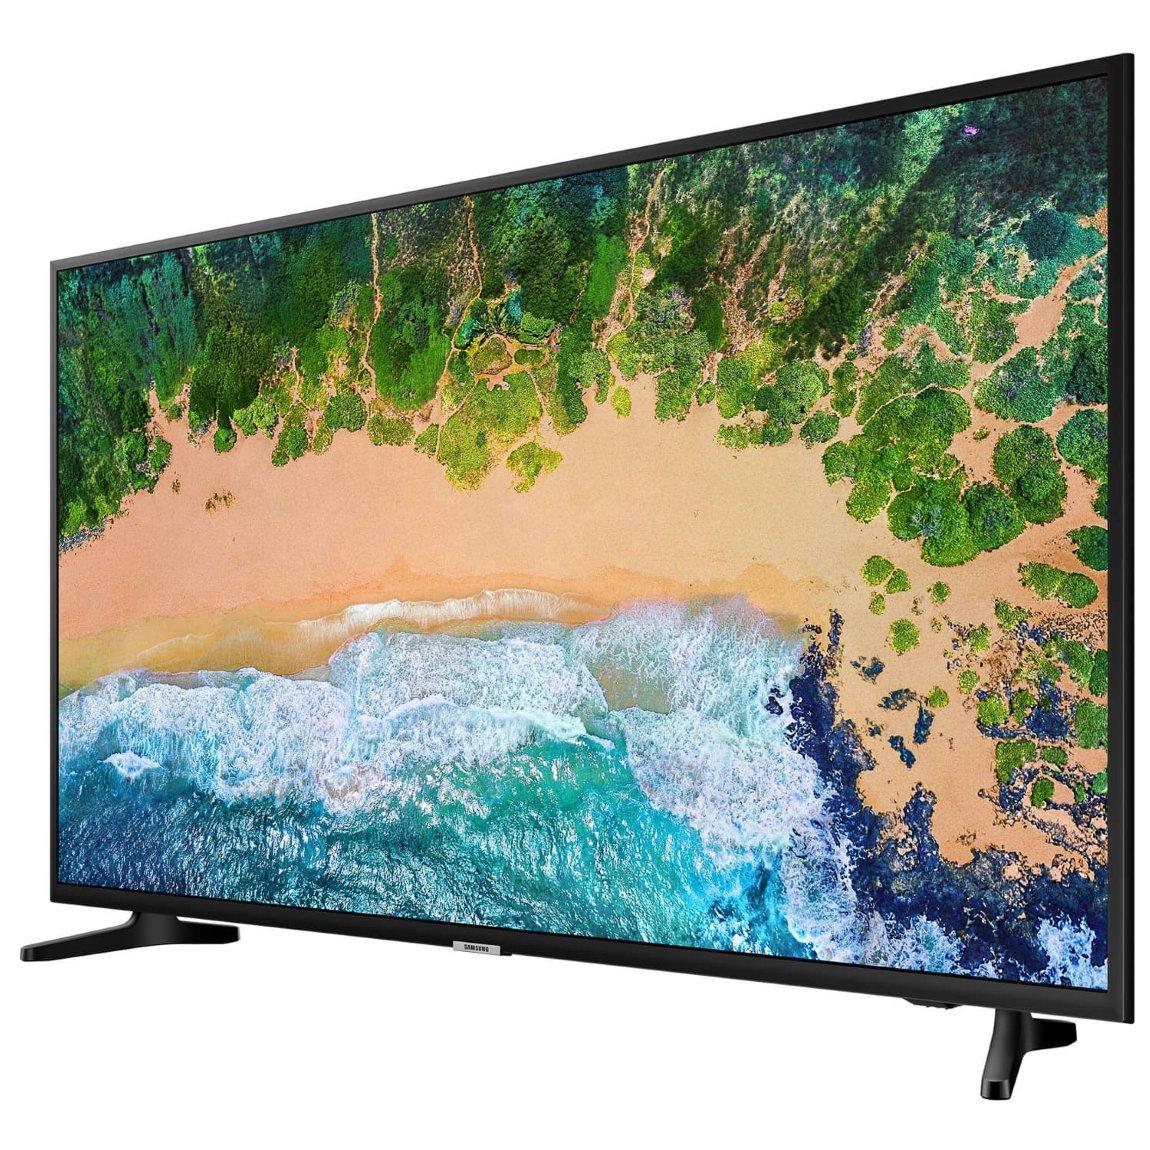 "Samsung 50"" Smart 4K Ultra HD TV £350 Instore at B&M"